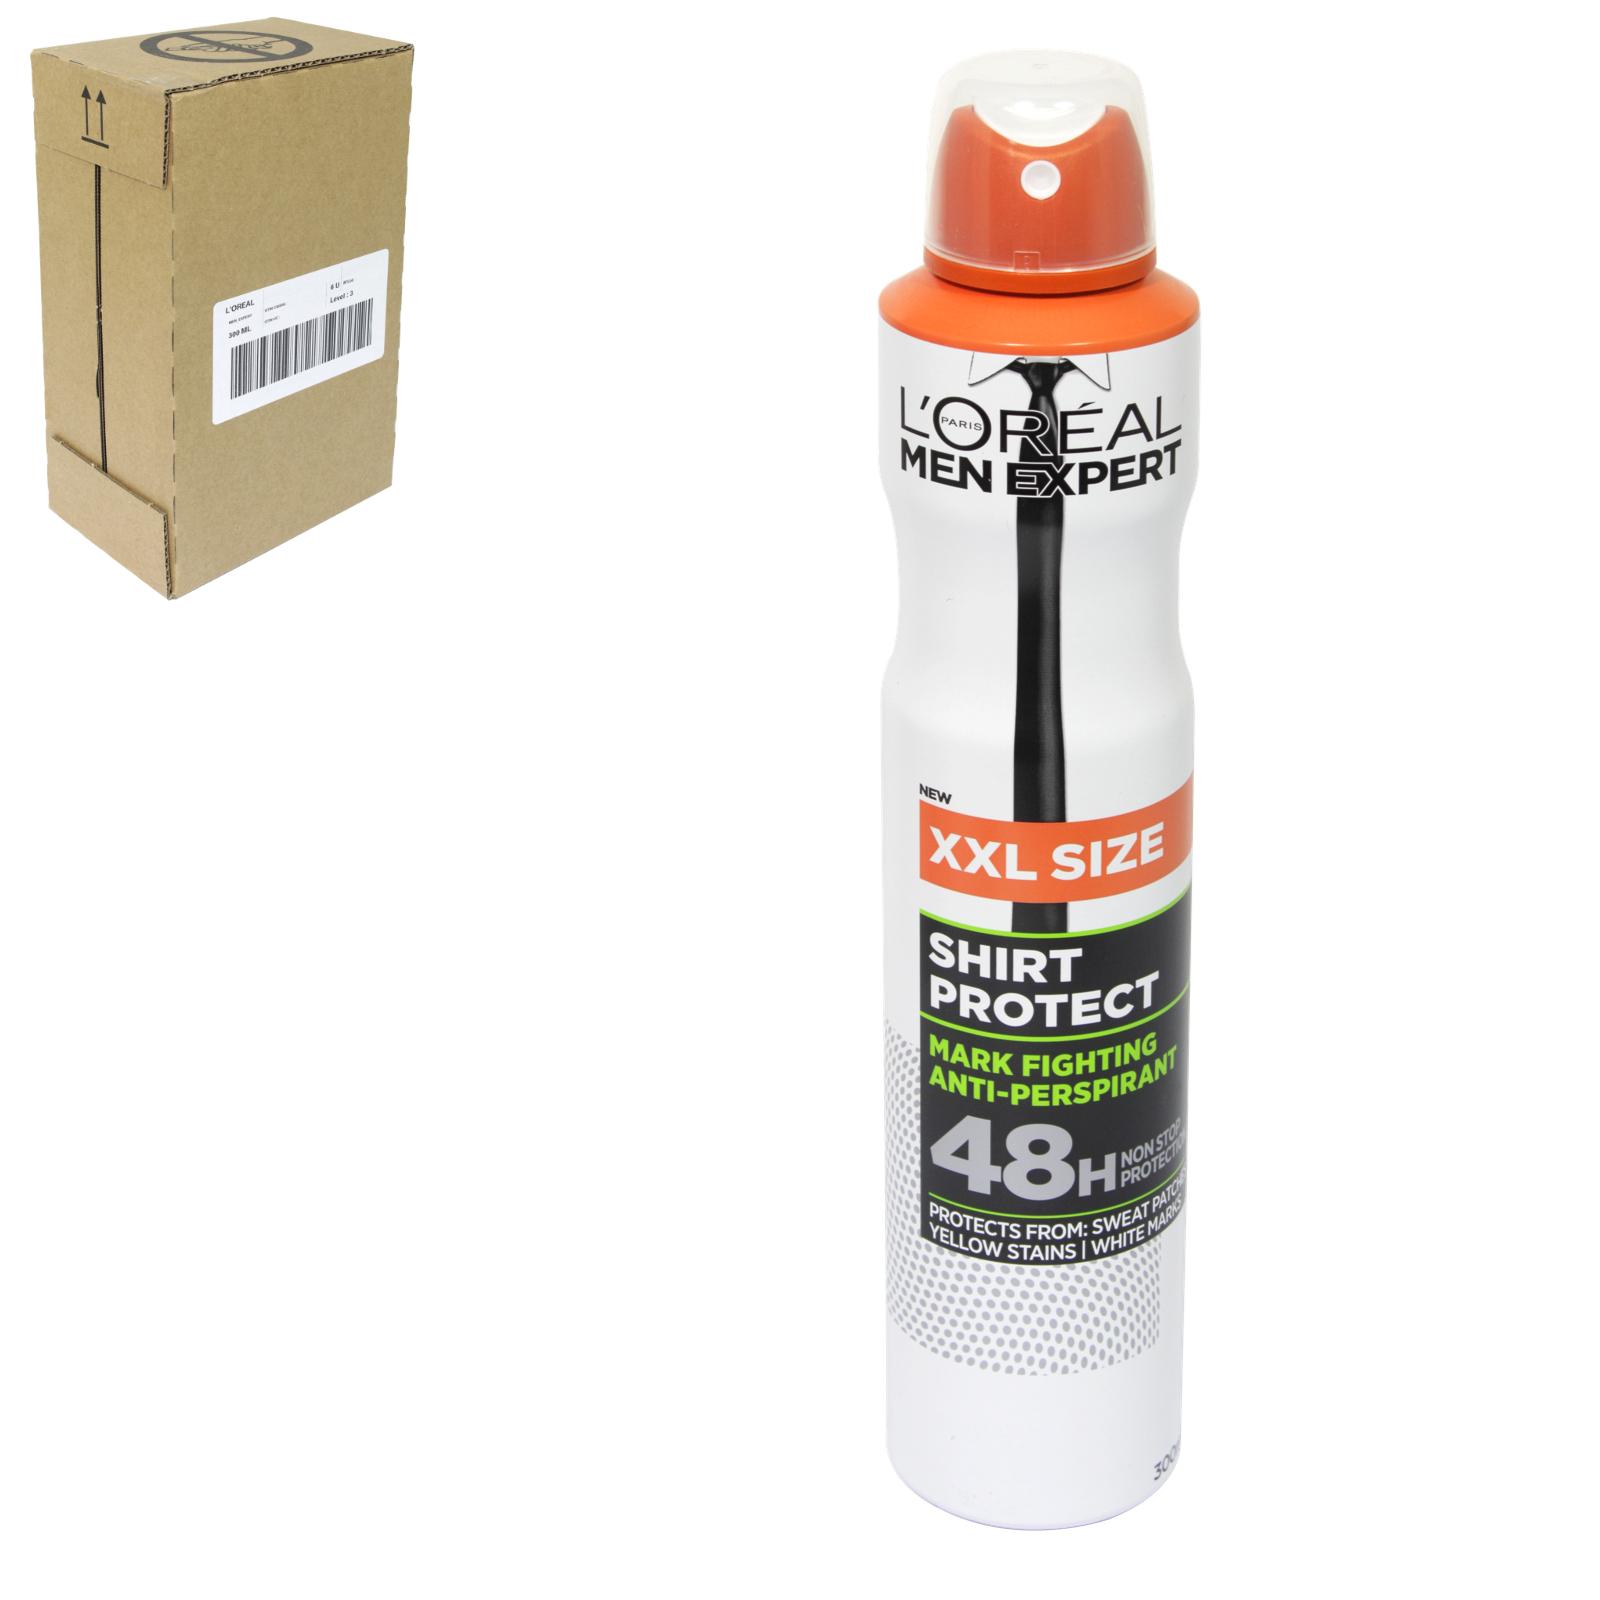 LOREAL MEN EXPERT DEO 250ML SHIRT PROTECT ANTI MARKS 100% X6